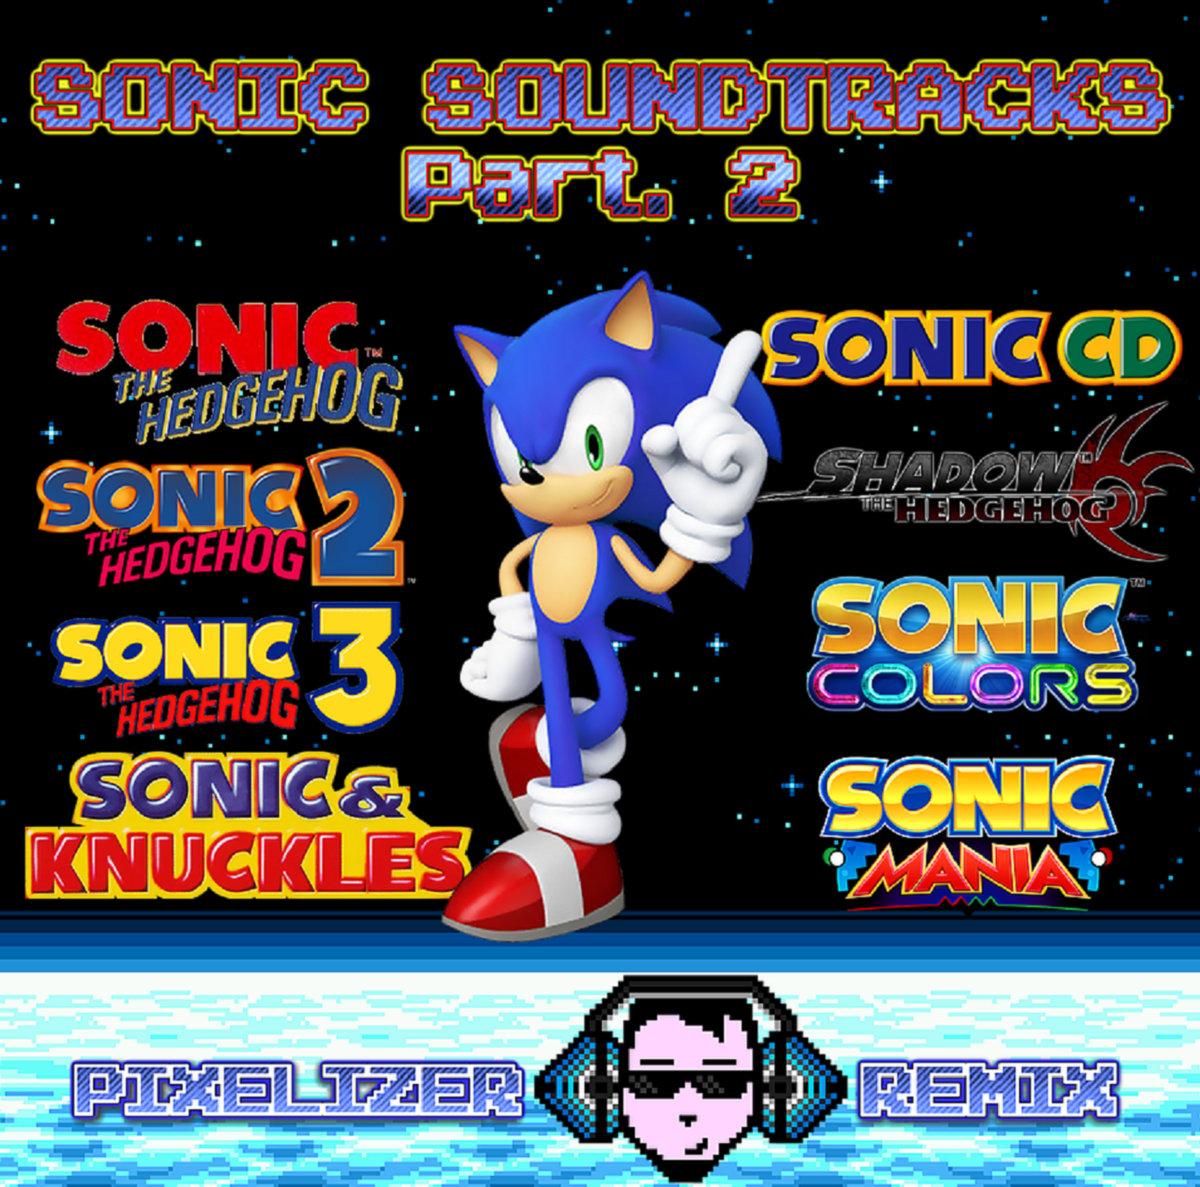 Sonic the Hedgehog 3 - Hydro City Zone - Pixelizer REMIX | Pixelizer